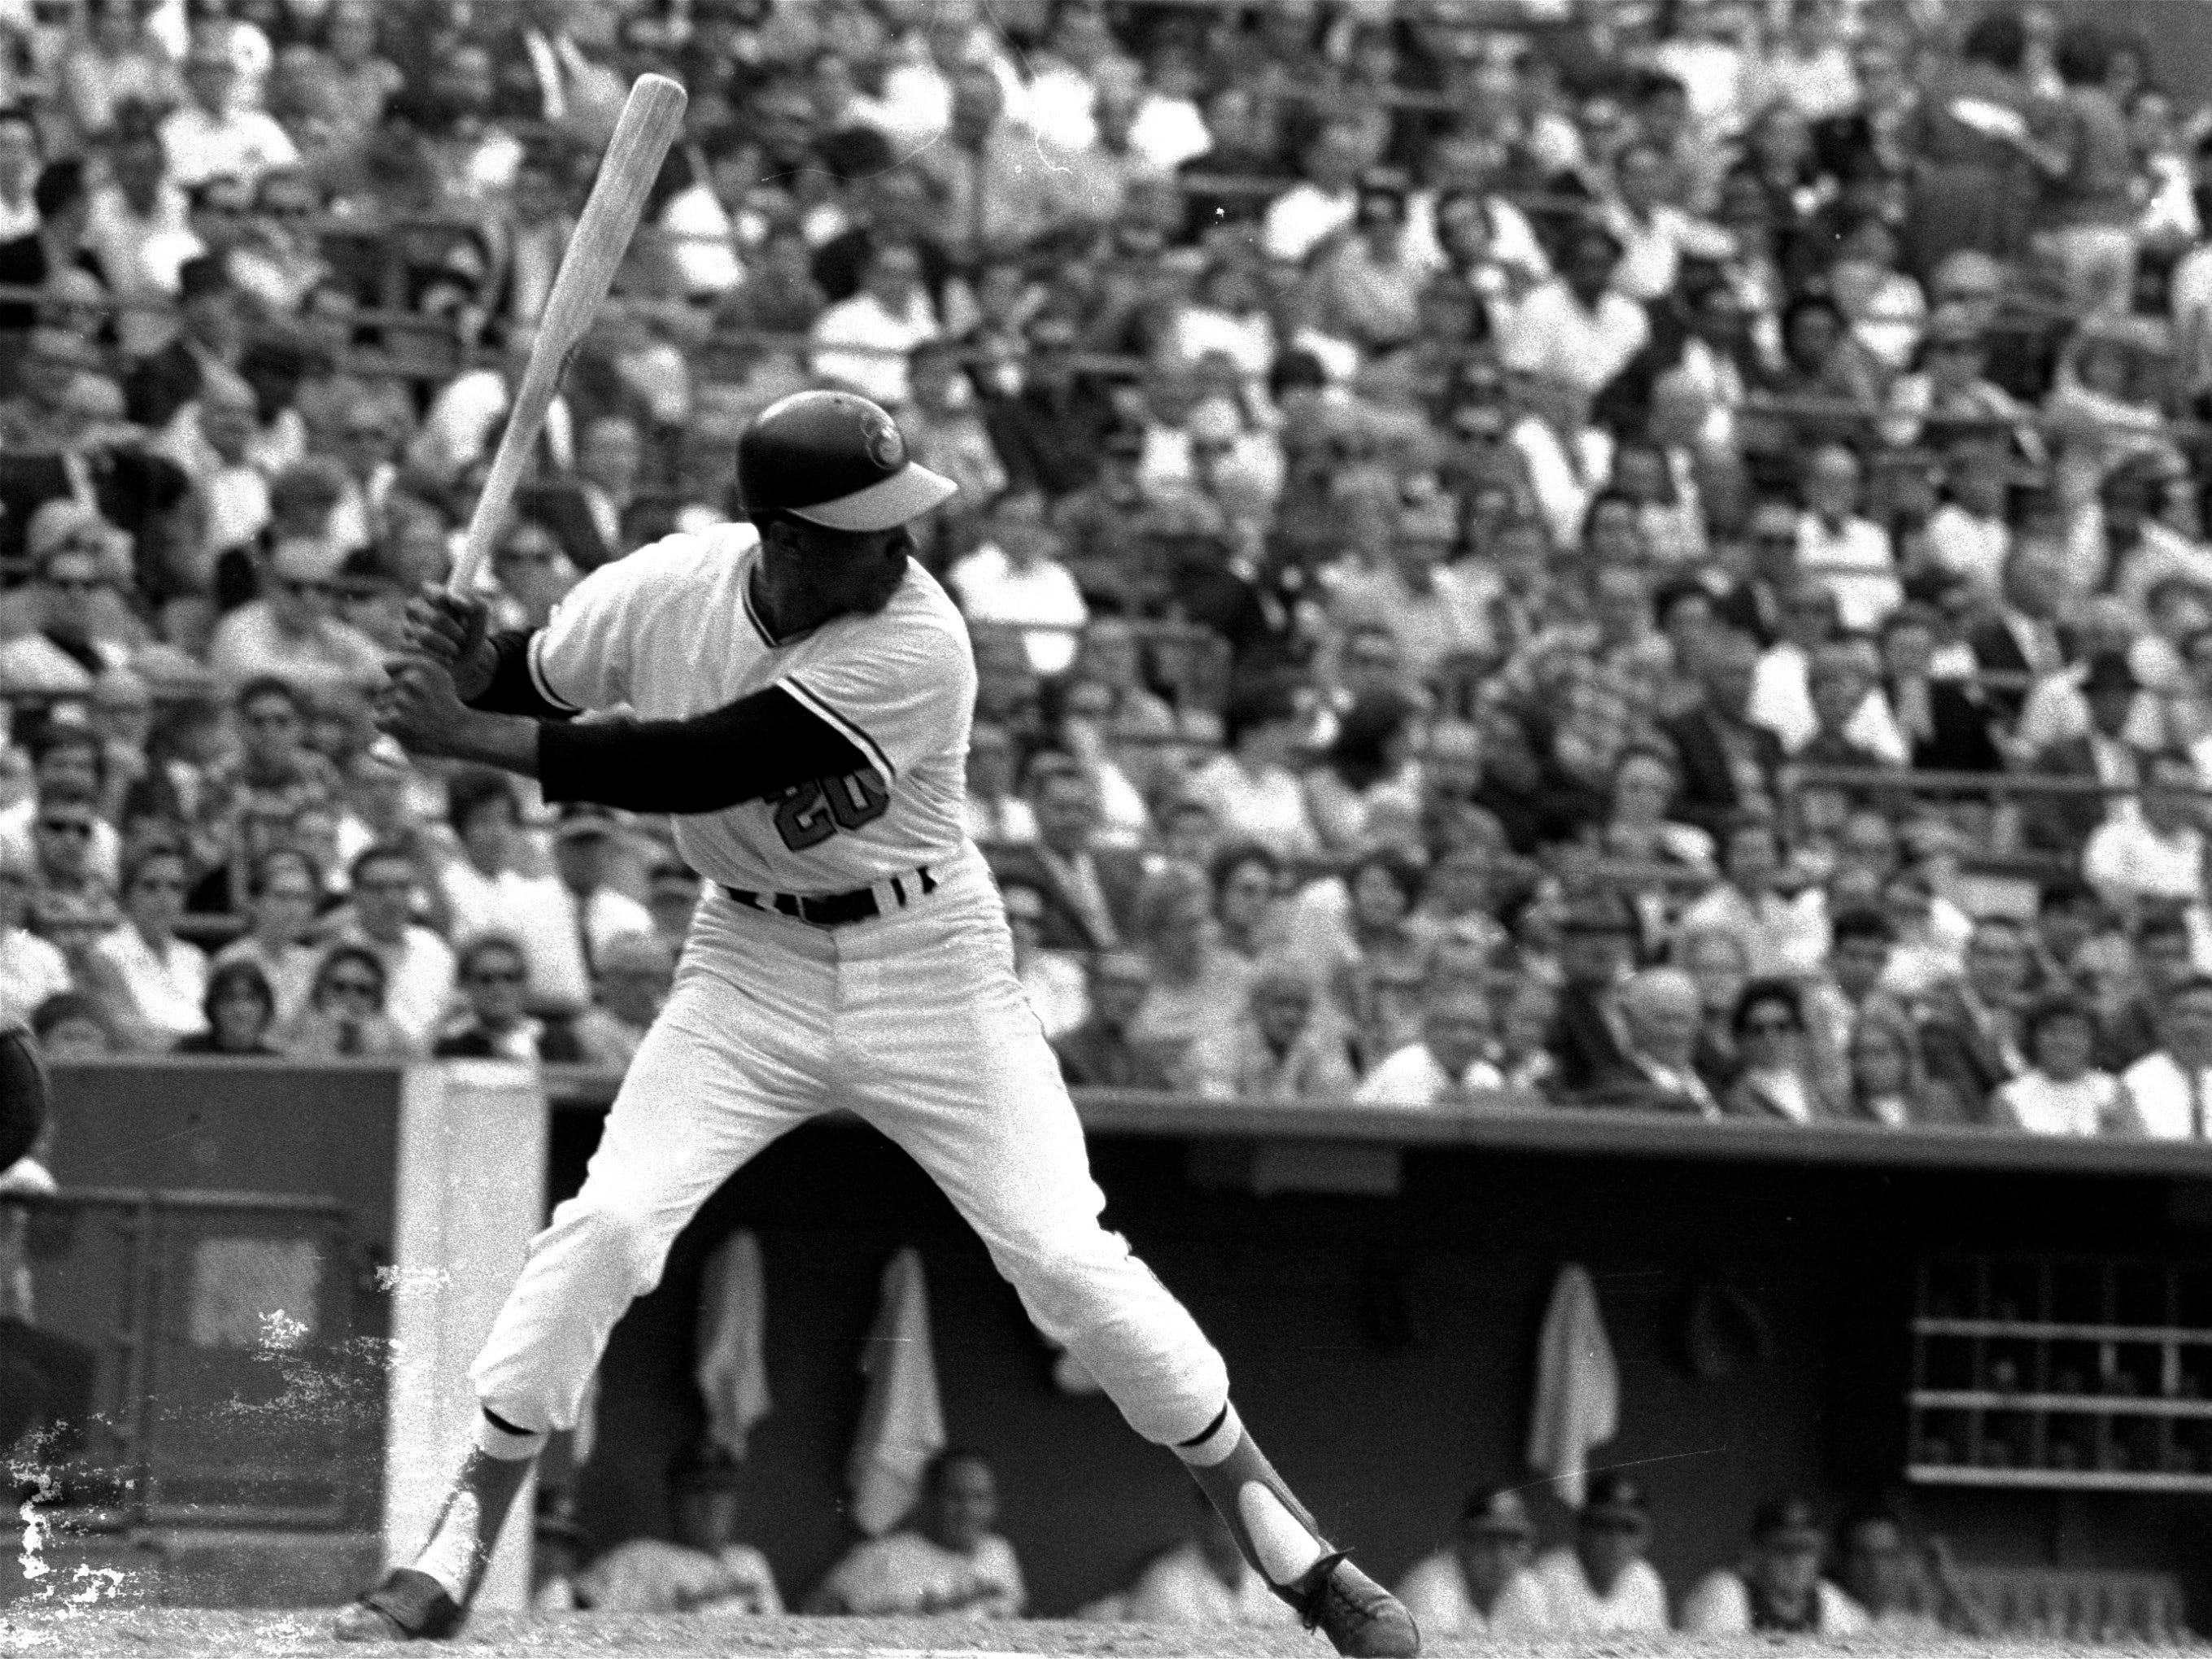 Frank Robinson, a 14-time All-Star, slugged 586 home runs over his career.